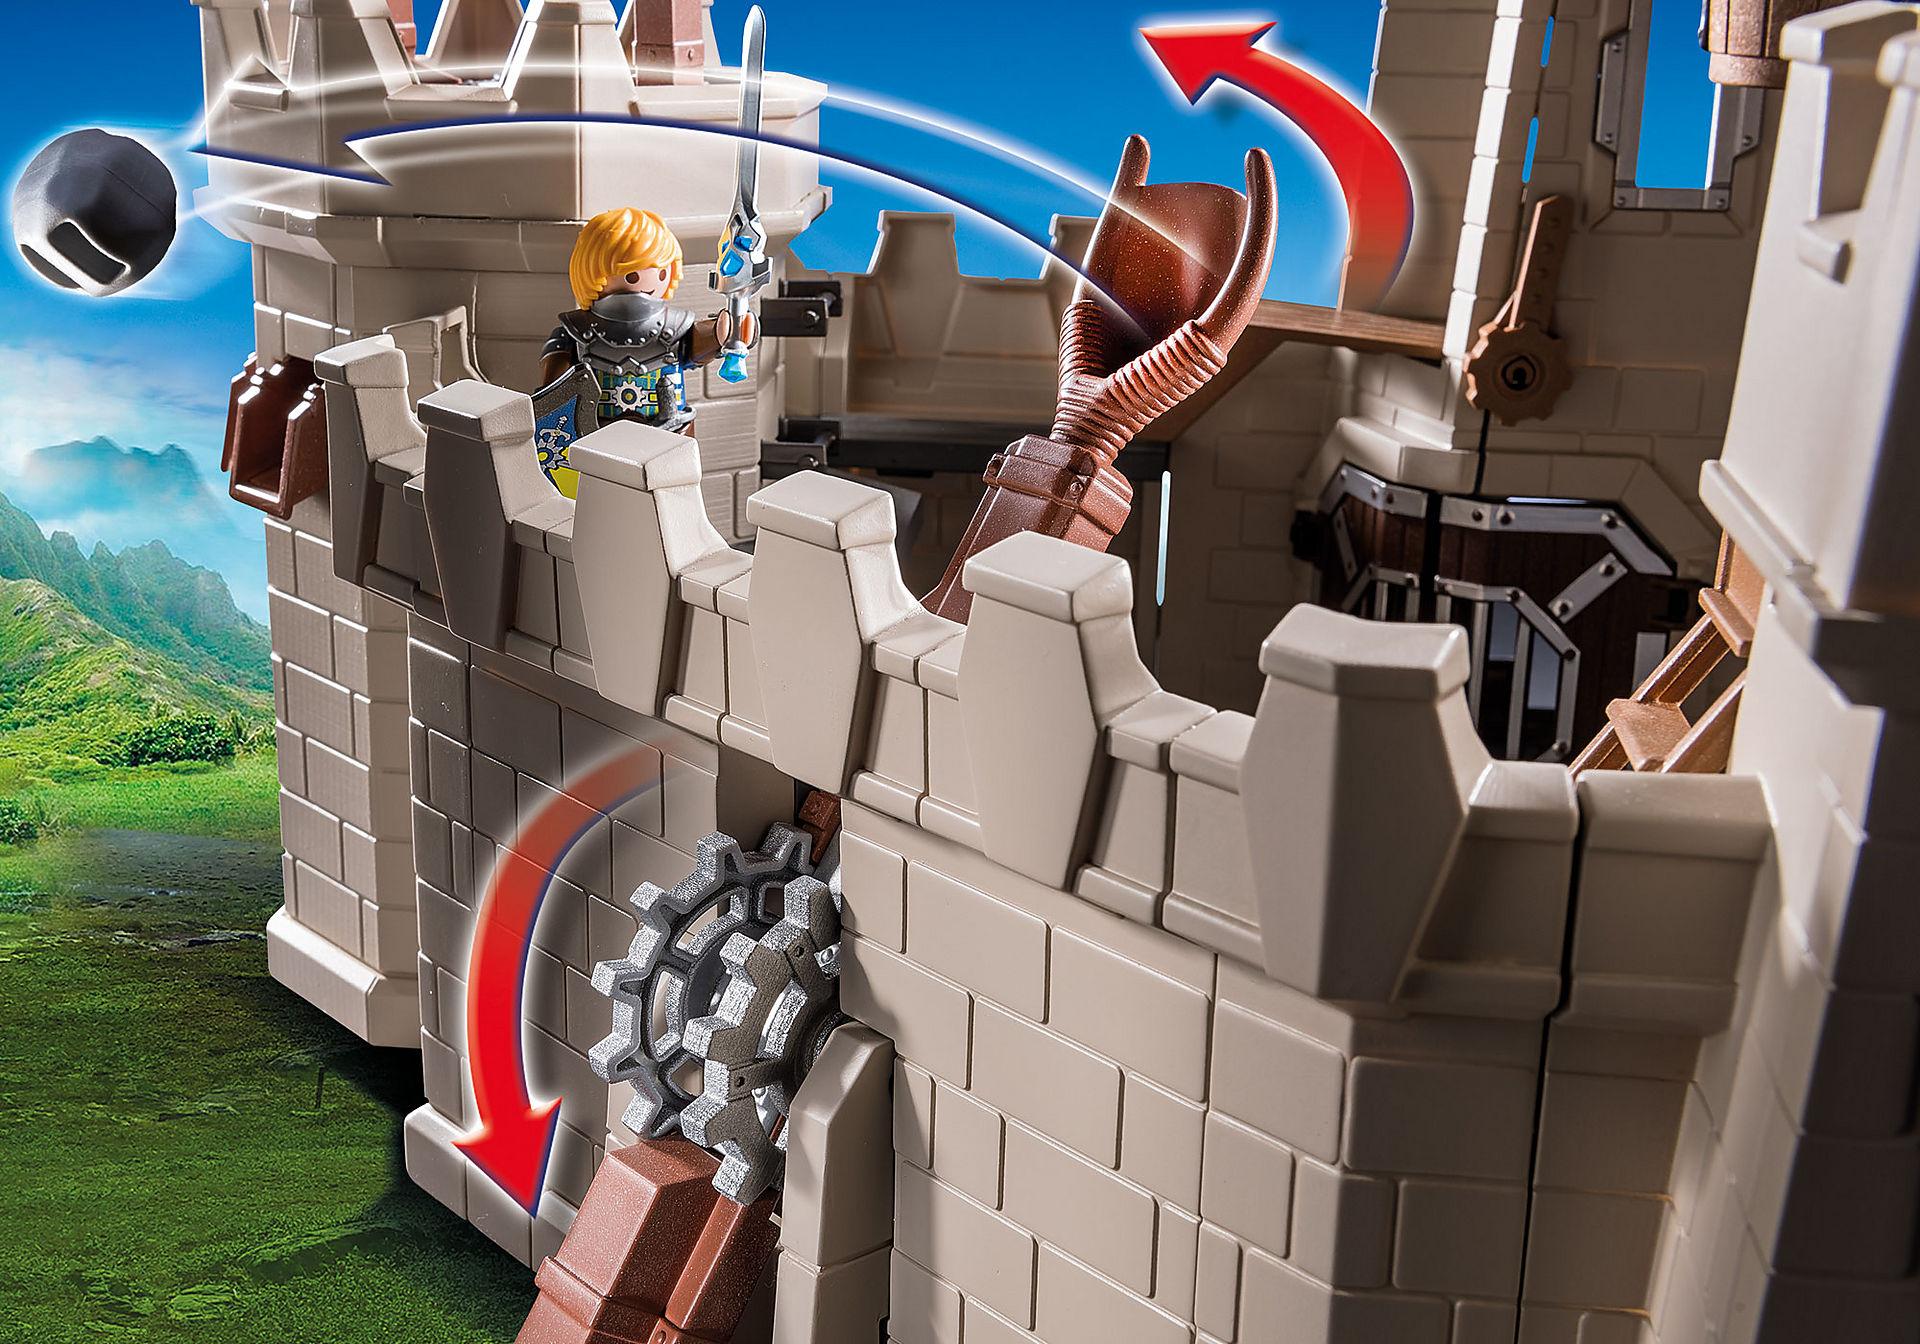 70220 Große Burg von Novelmore zoom image9